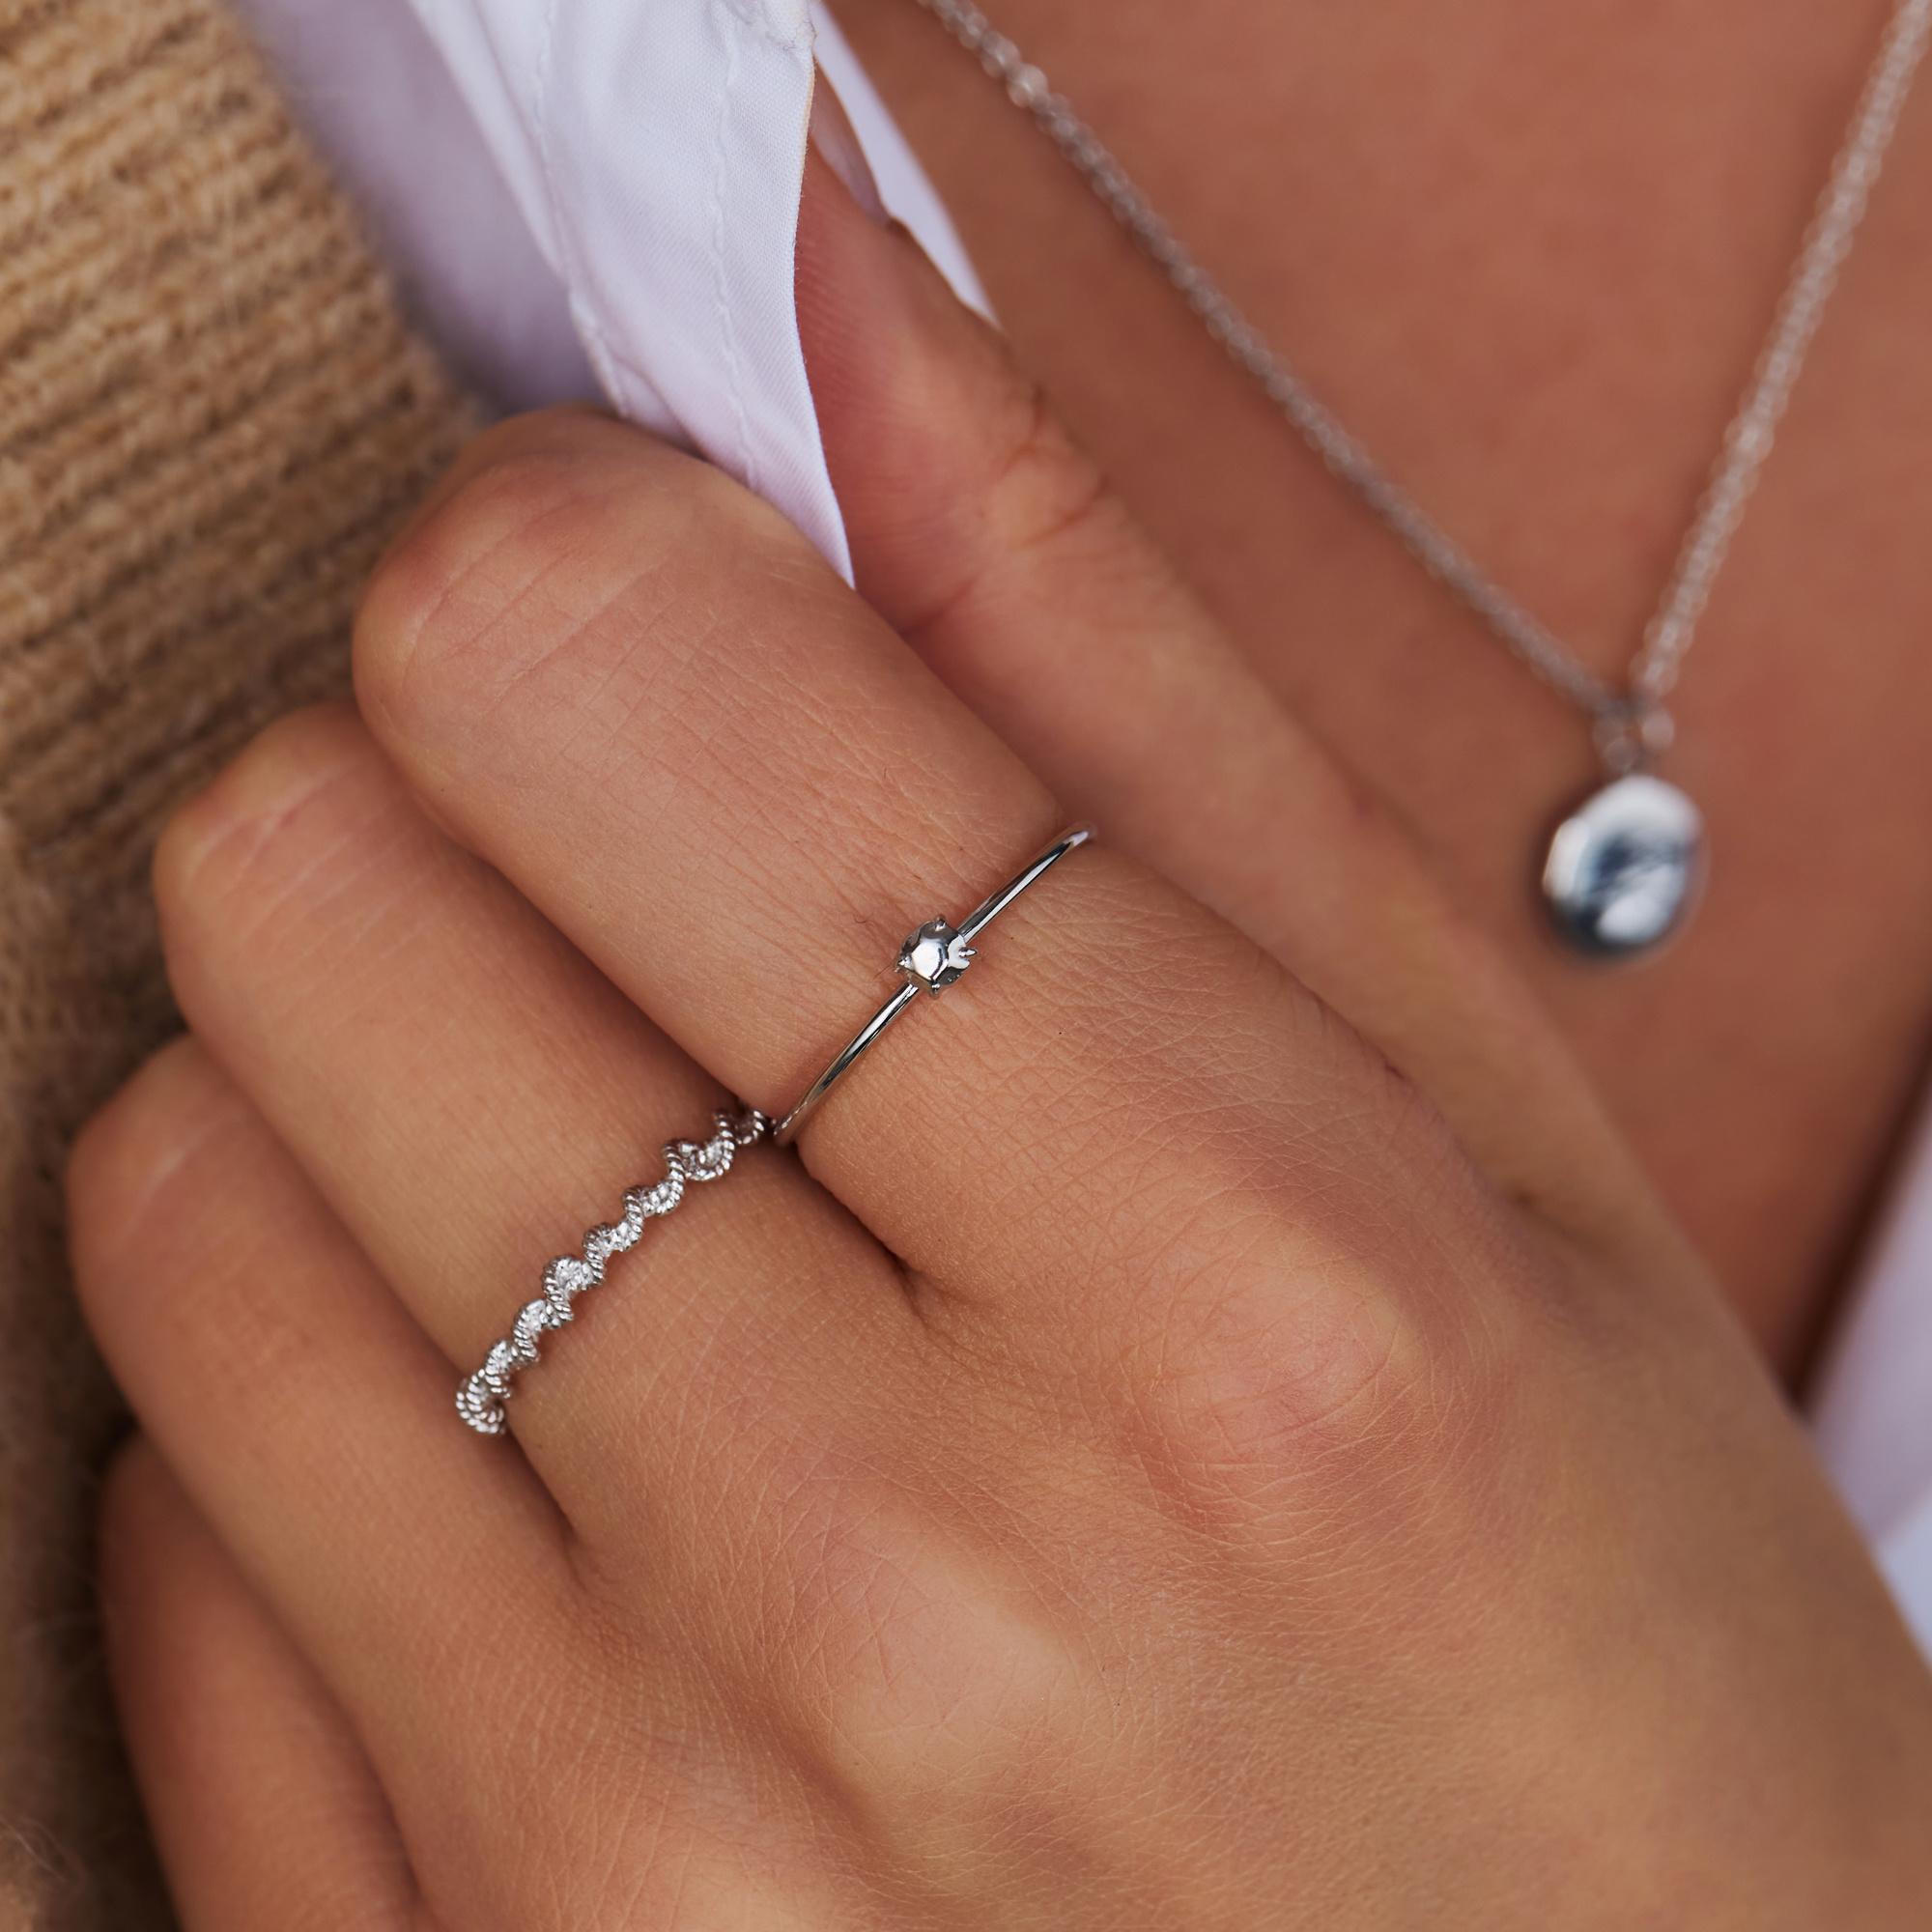 Violet Hamden Sisterhood Lunar ring i 925 sterling silver